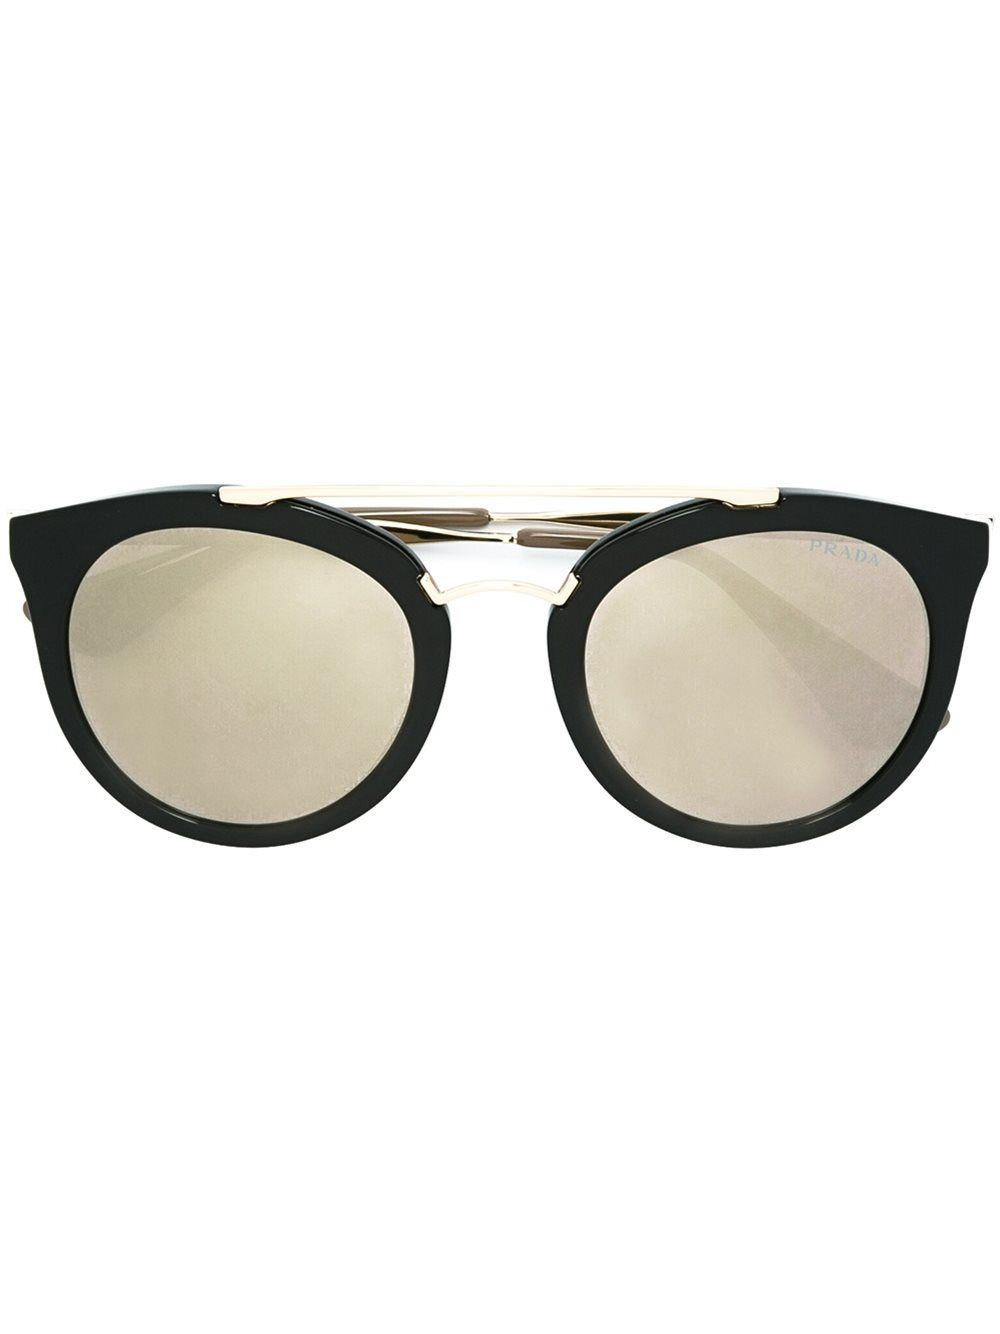 f3d5b0ac9db7 low cost prada eyewear round frame sunglasses black gold women  accessoriesprada glasses optical expressdesigner fashionprada eyewear